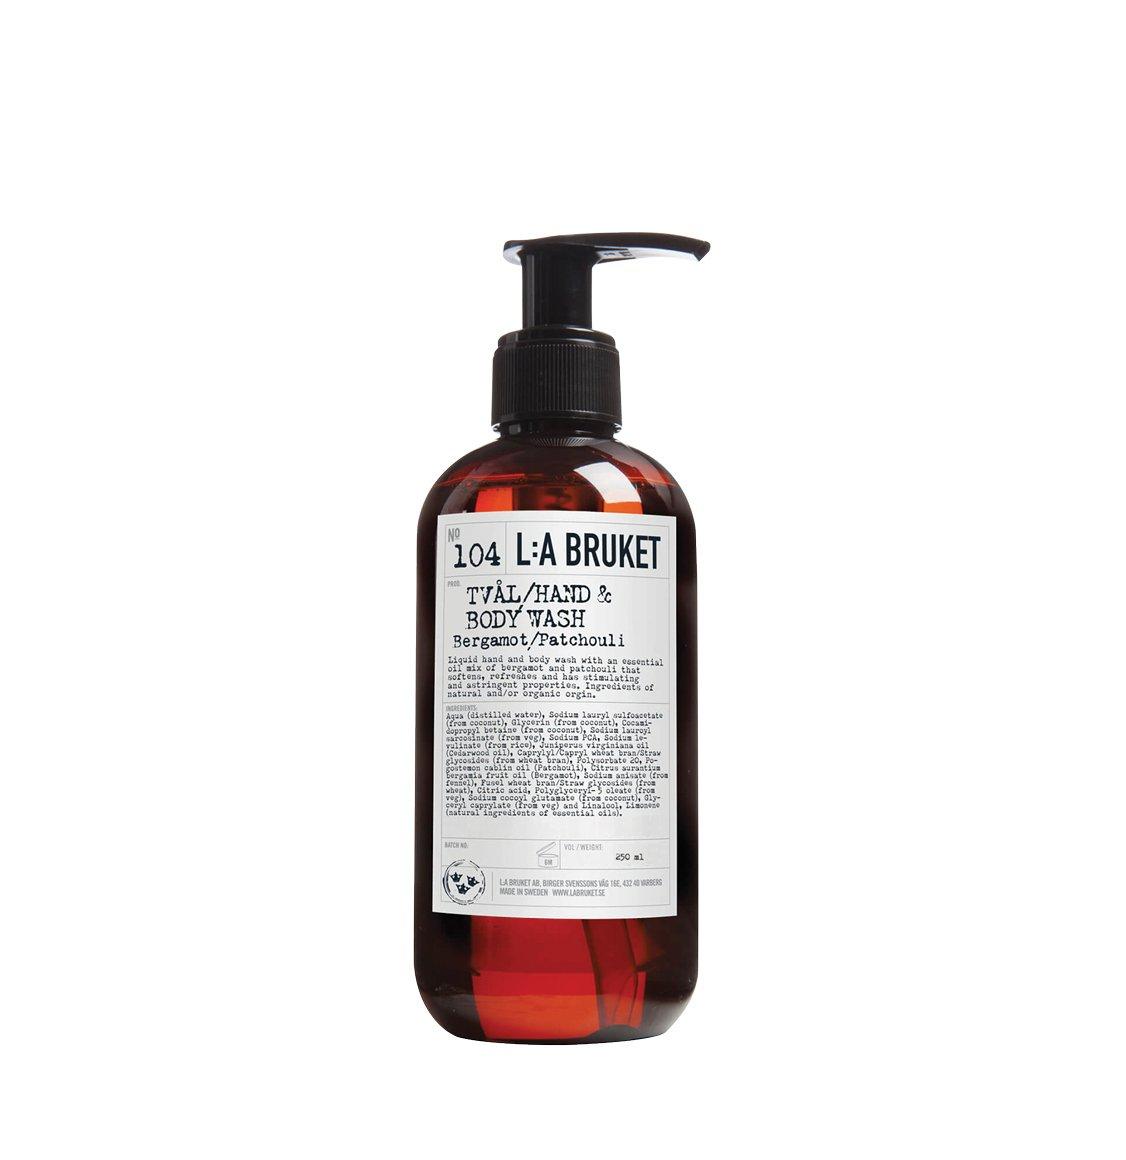 LA Bruket 104 Hand and Body Wash Bergamot and Patchouli 240ml